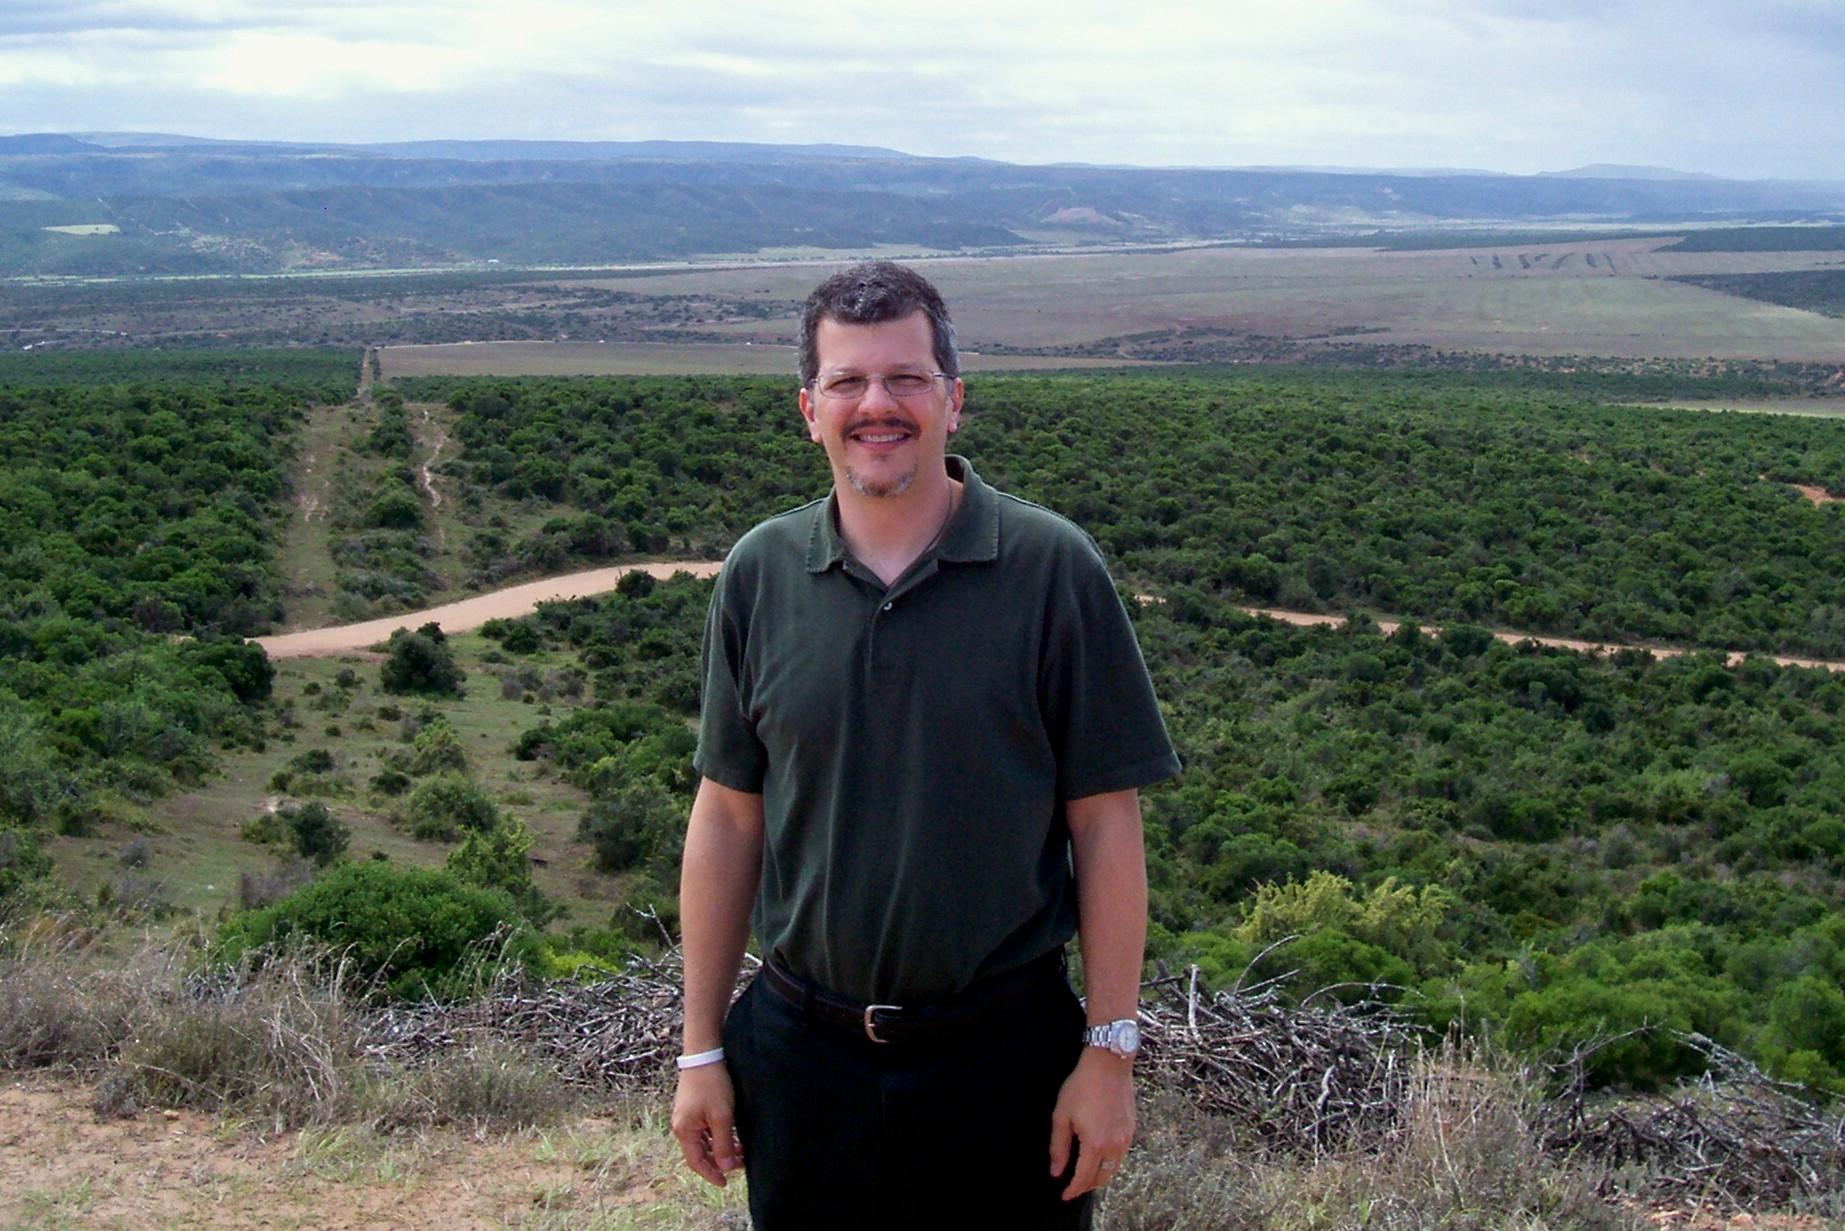 Addo Elephant National Park, Eastern Cape